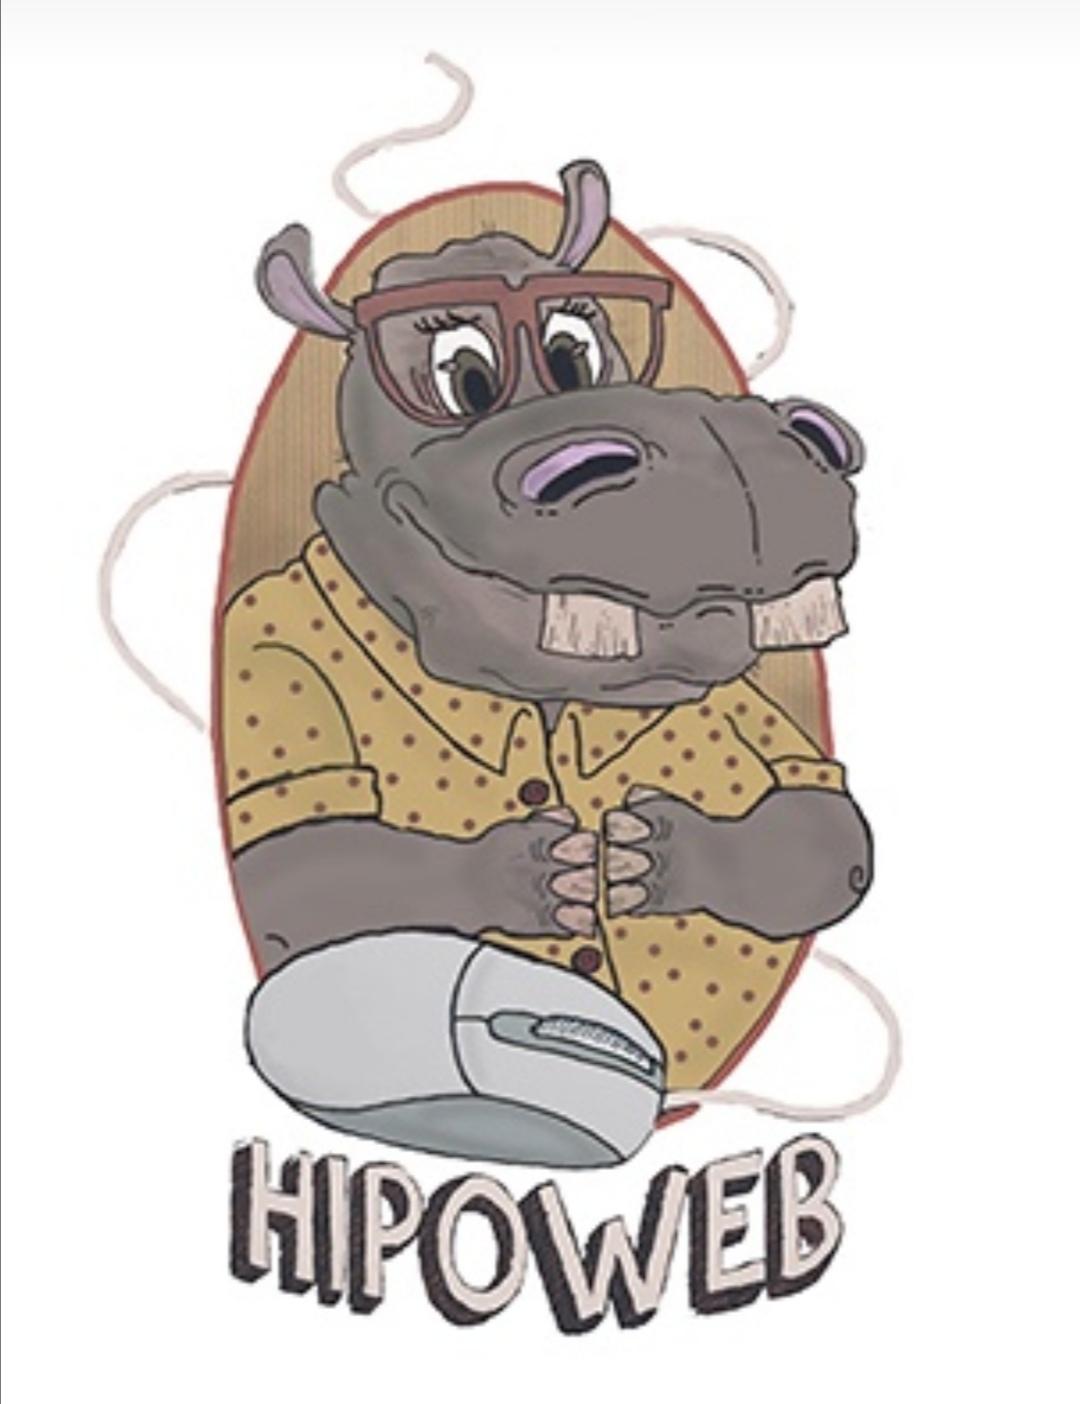 Hipoweb